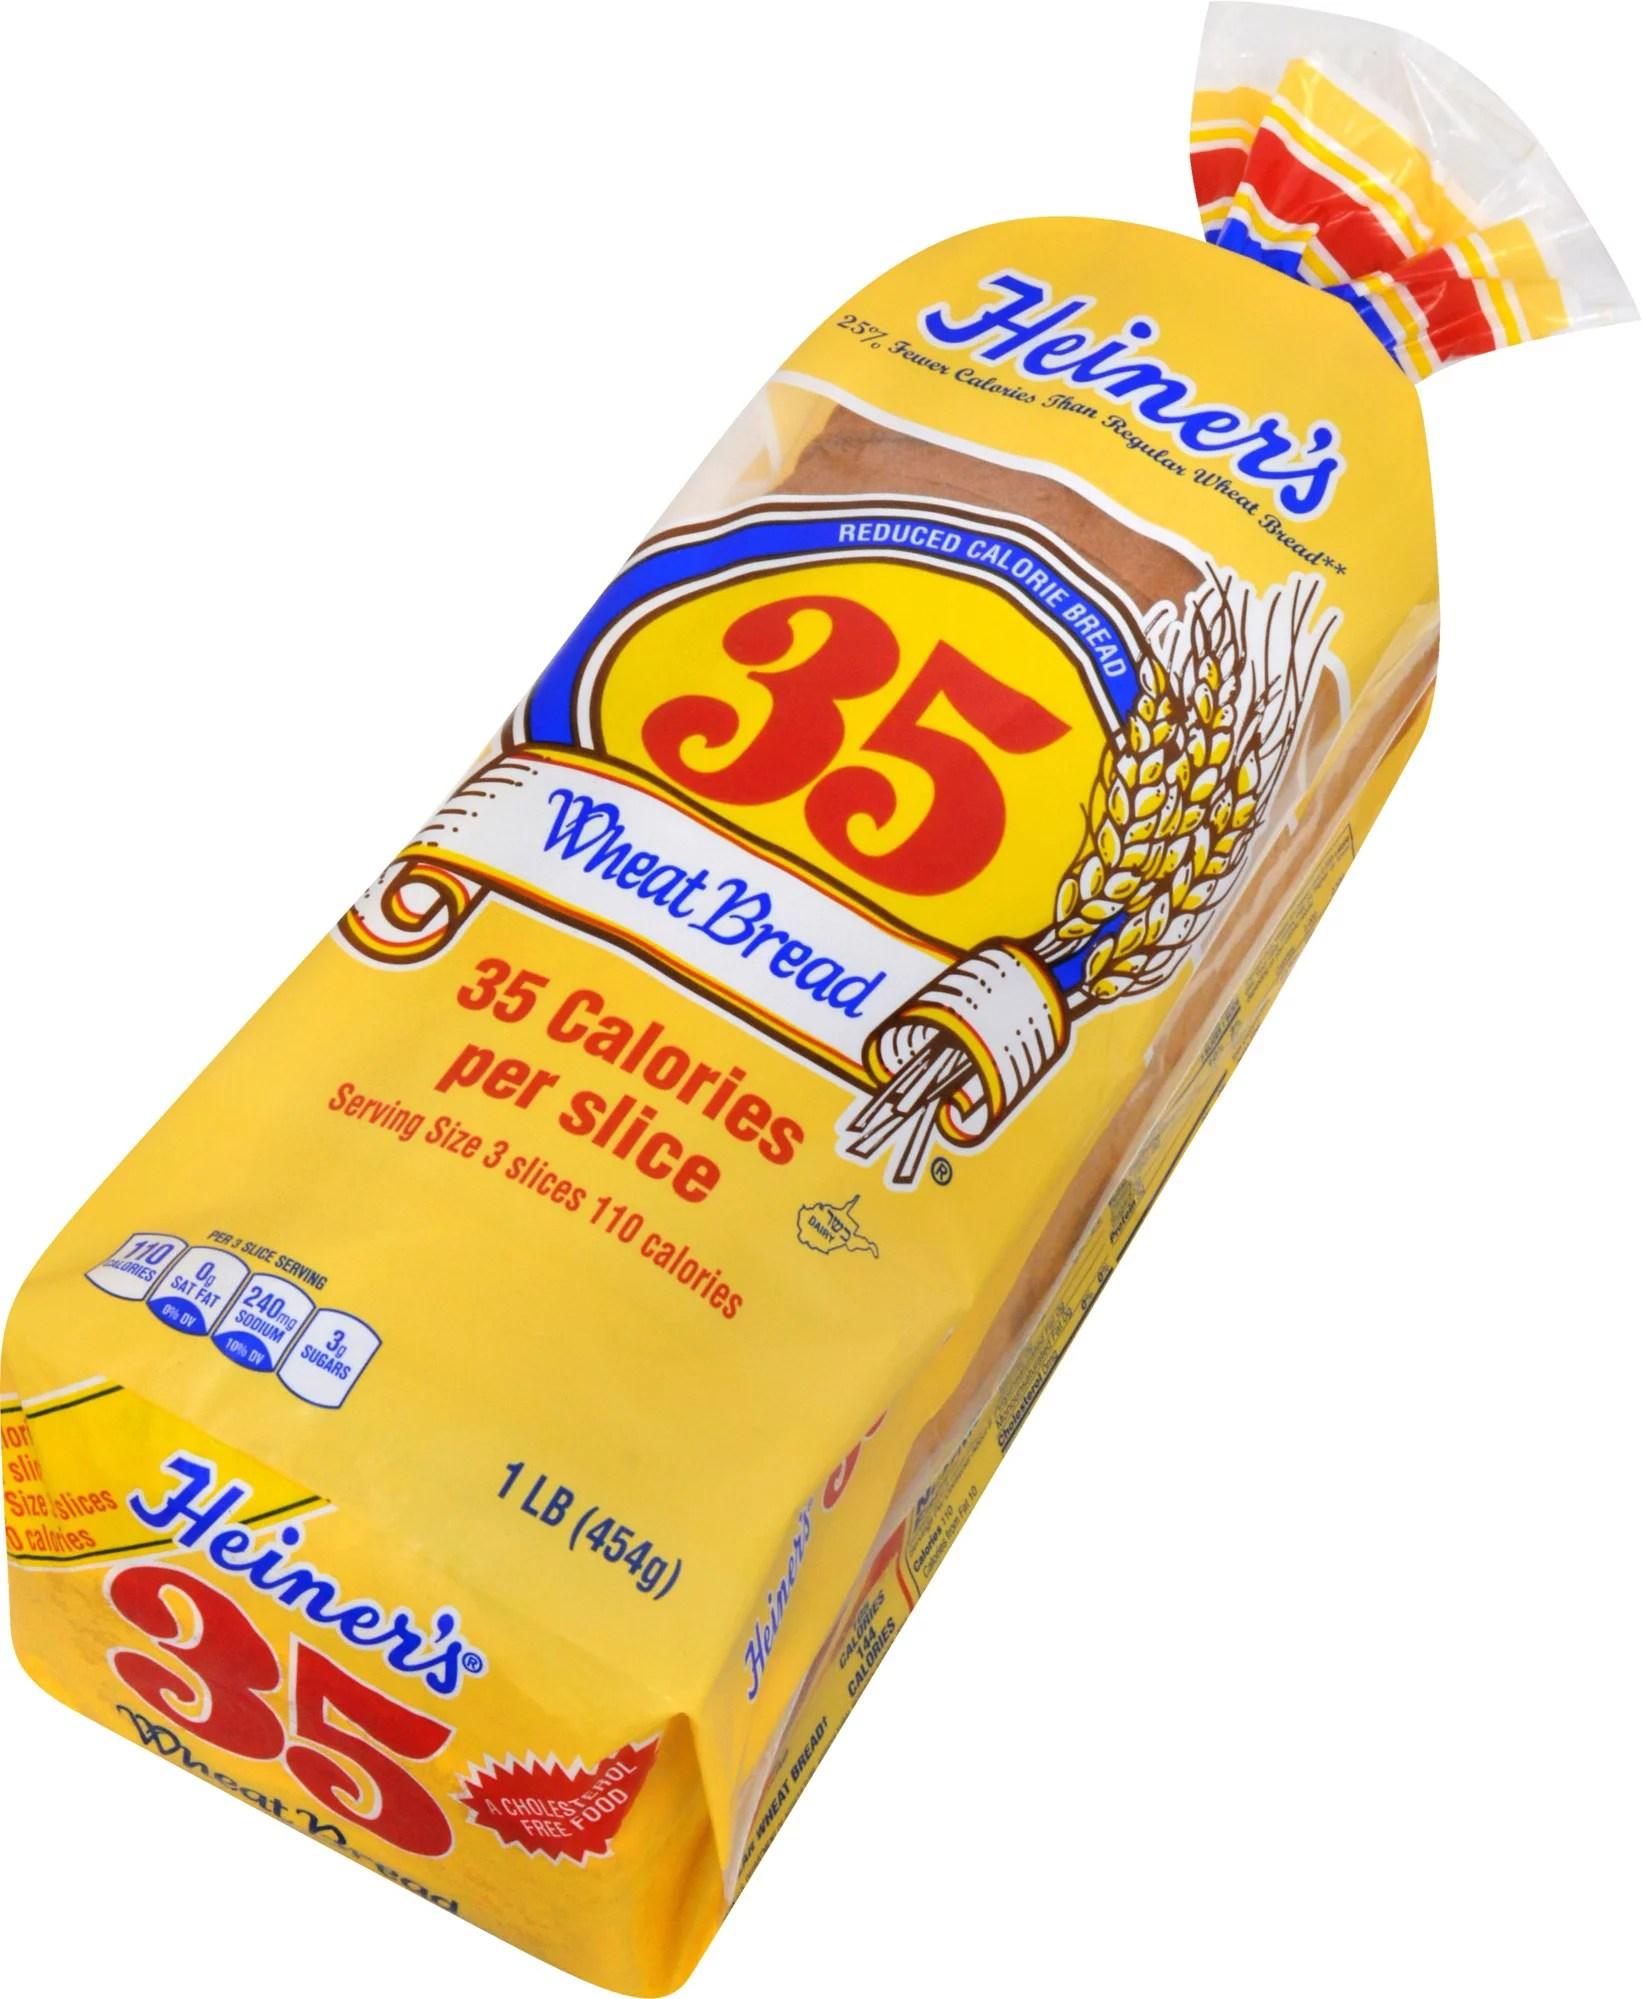 Heiner?s 35 Reduced Calorie Wheat Bread 16 oz - Walmart.com